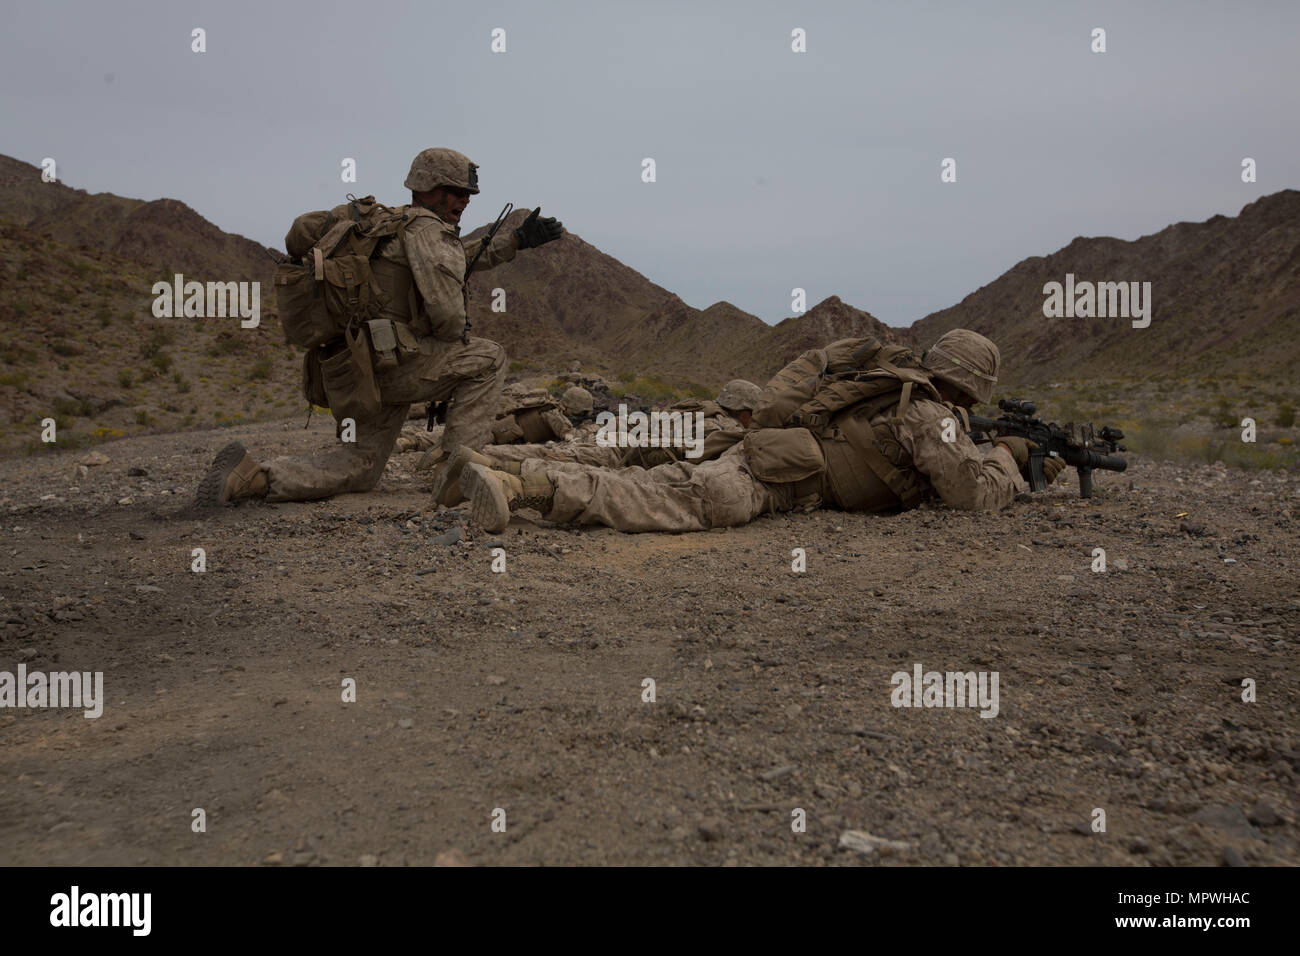 u s marines with golf company 2nd battalion 6th marine regiment